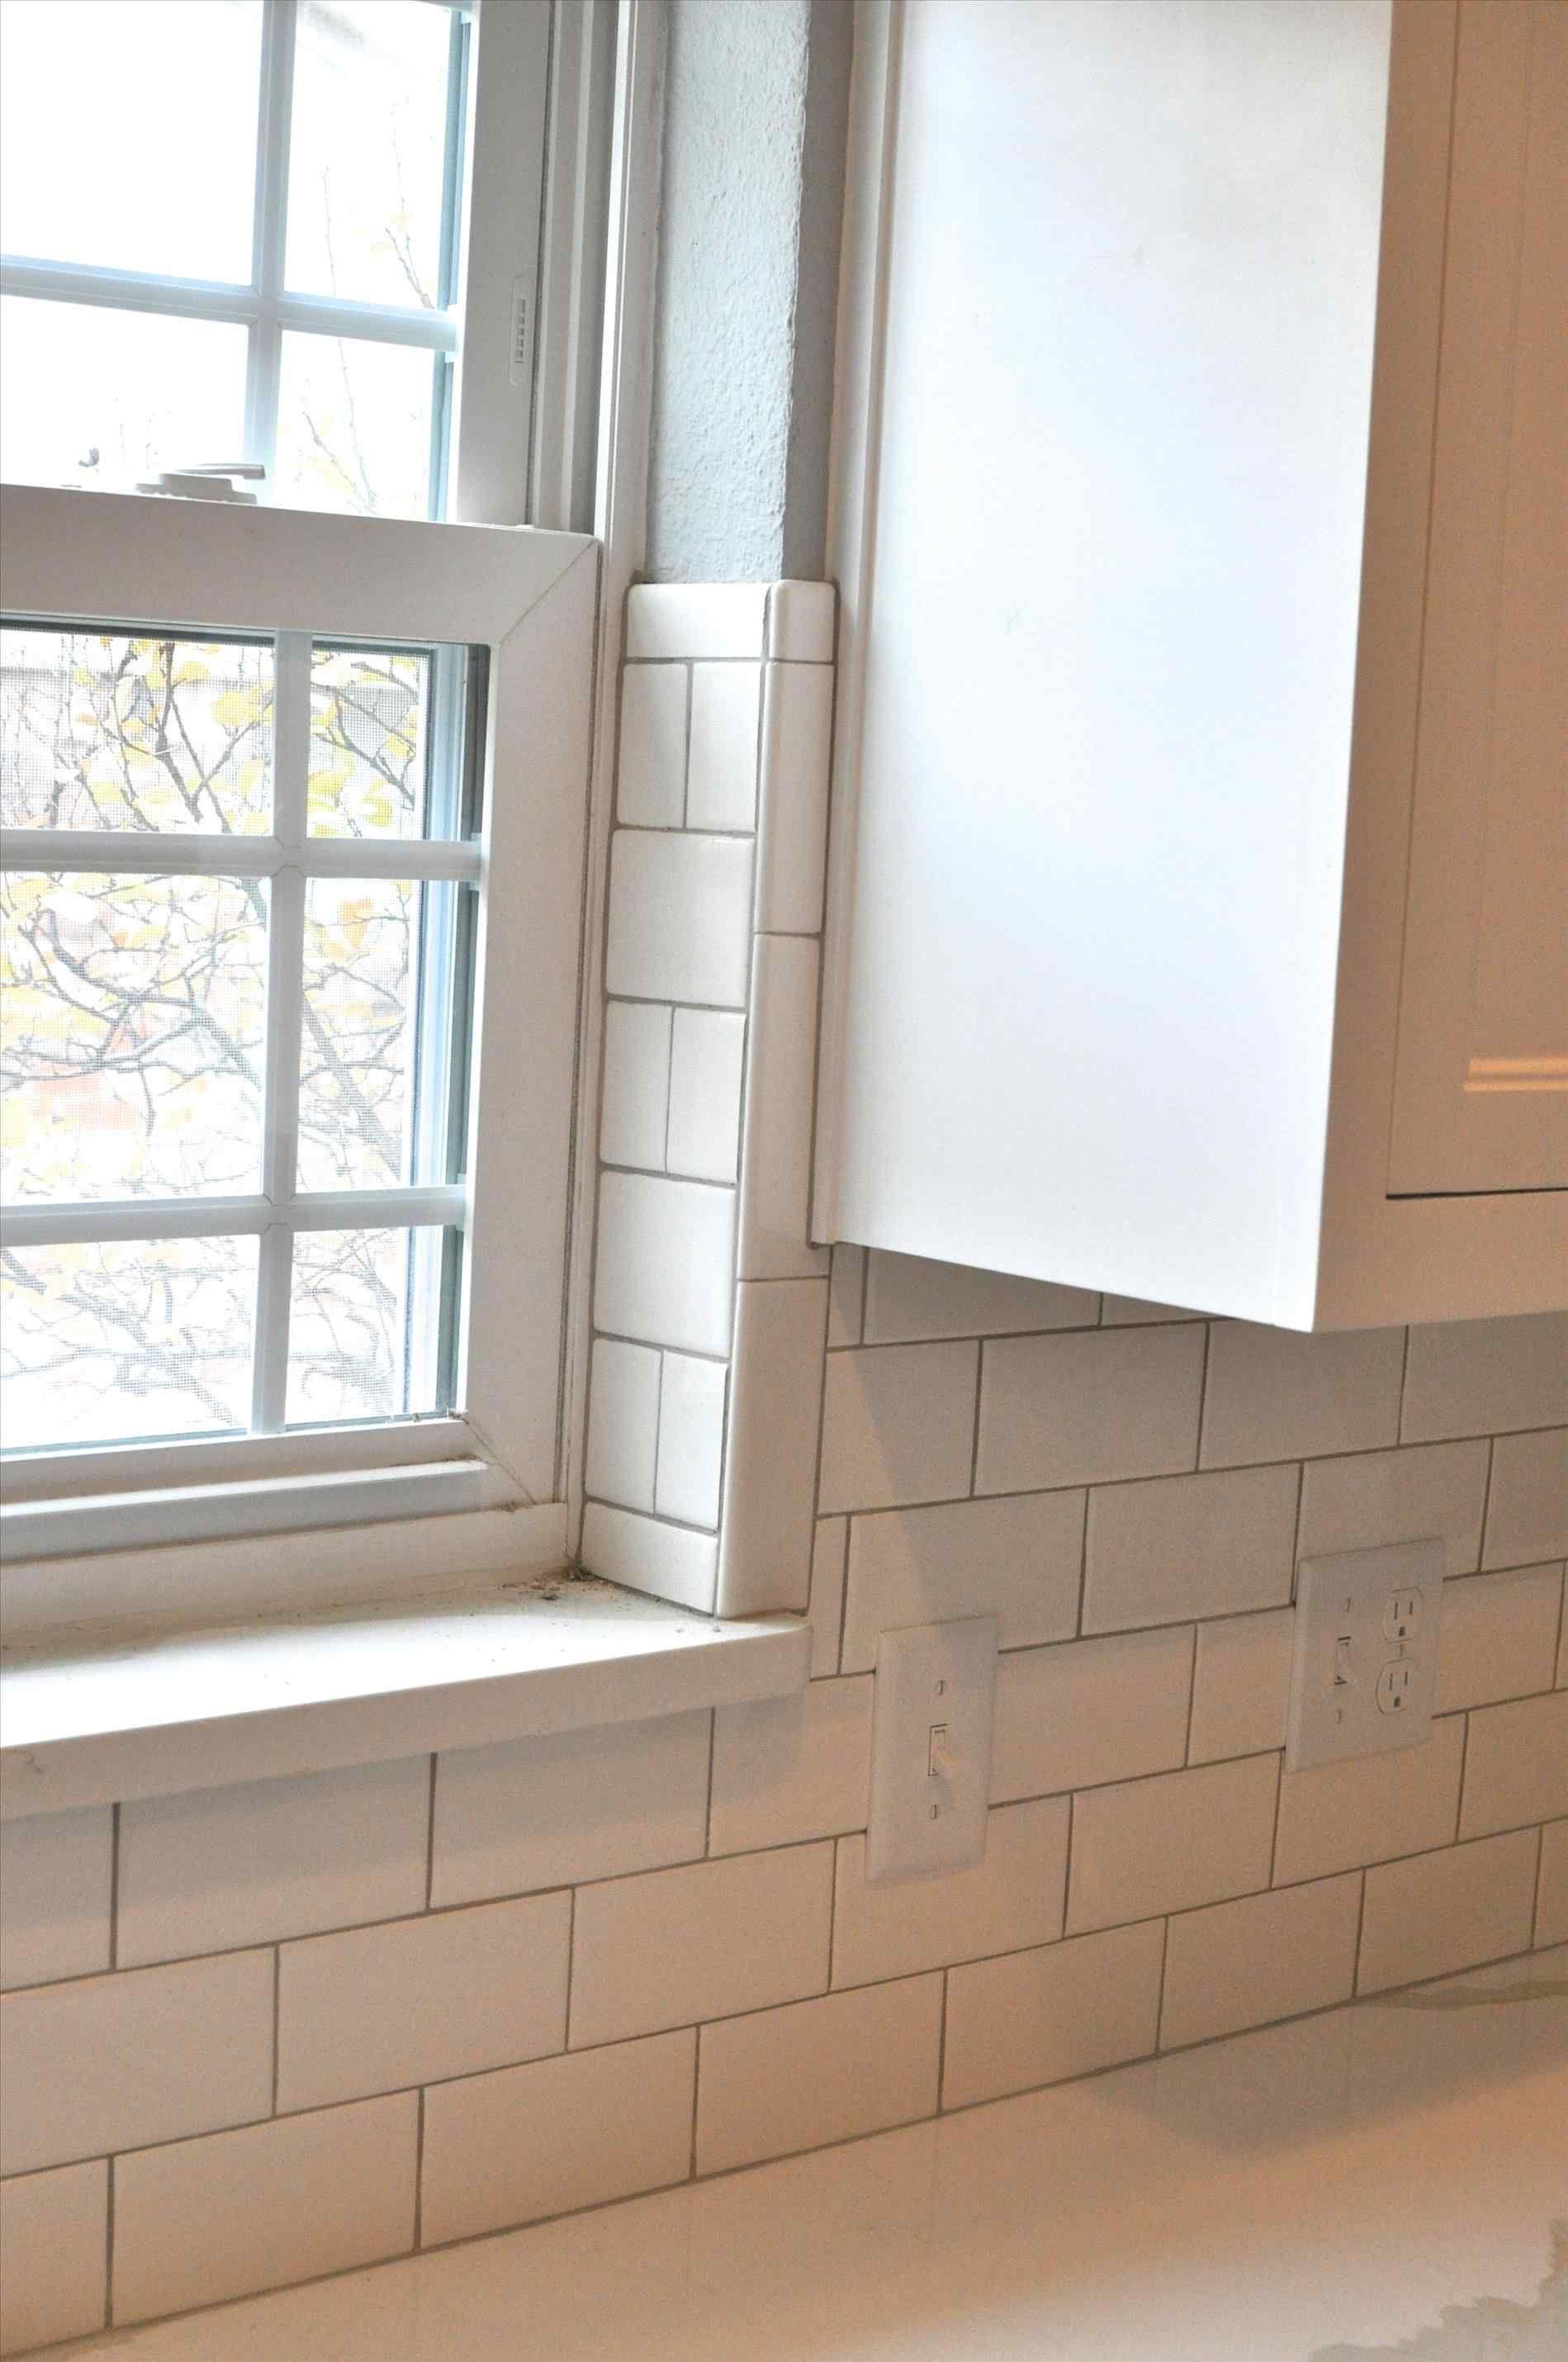 Https I Pinimg Com Originals 04 2b E2 042be285a871b0b2e76b2a6454ce88c1 Jpg Kitchen Tiles Backsplash Trendy Kitchen Backsplash Kitchen Window Sill